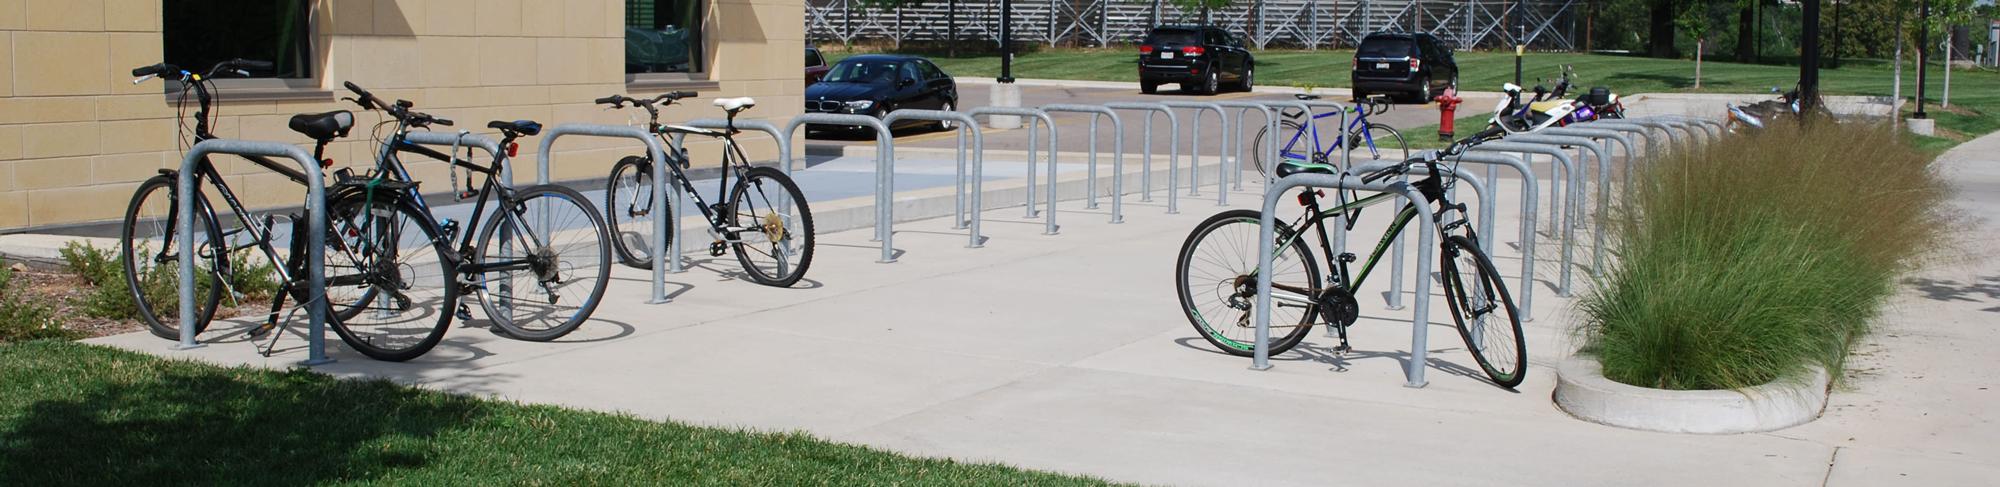 U-Rack-Bike-Rack-Category-Image-1